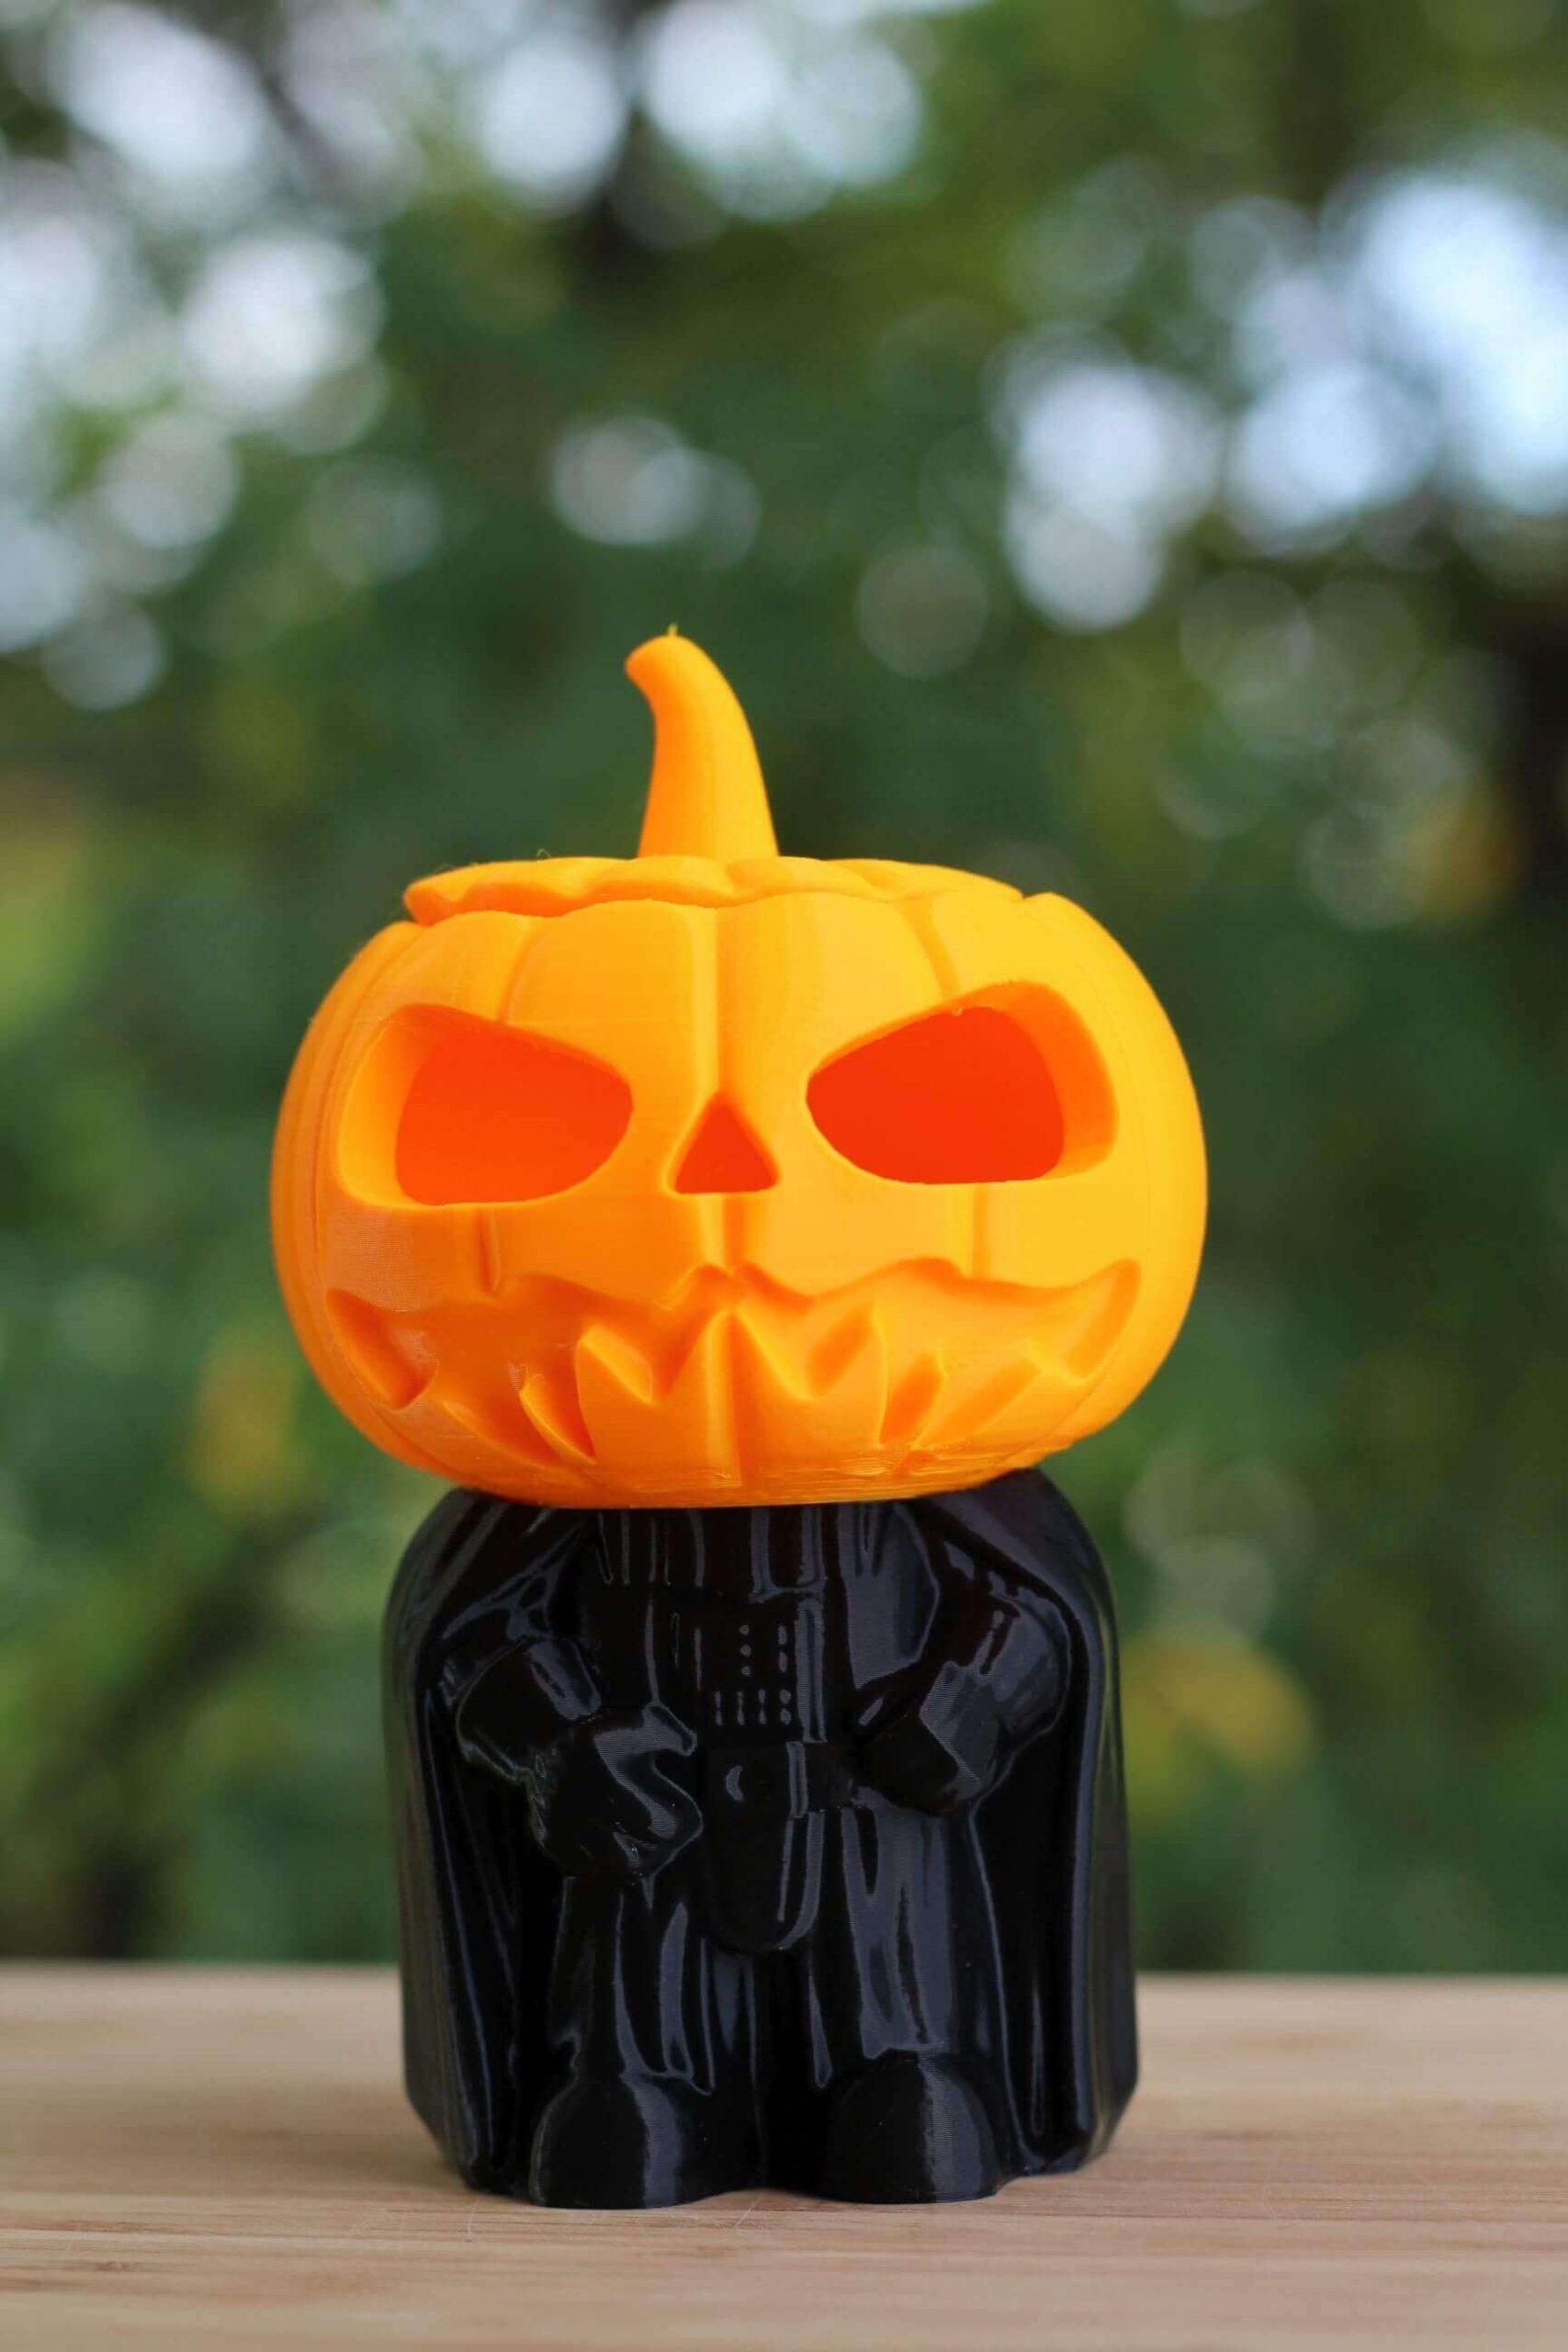 Darth-Pumpkin-printedo-n-the-Creality-CR-6-SE-5